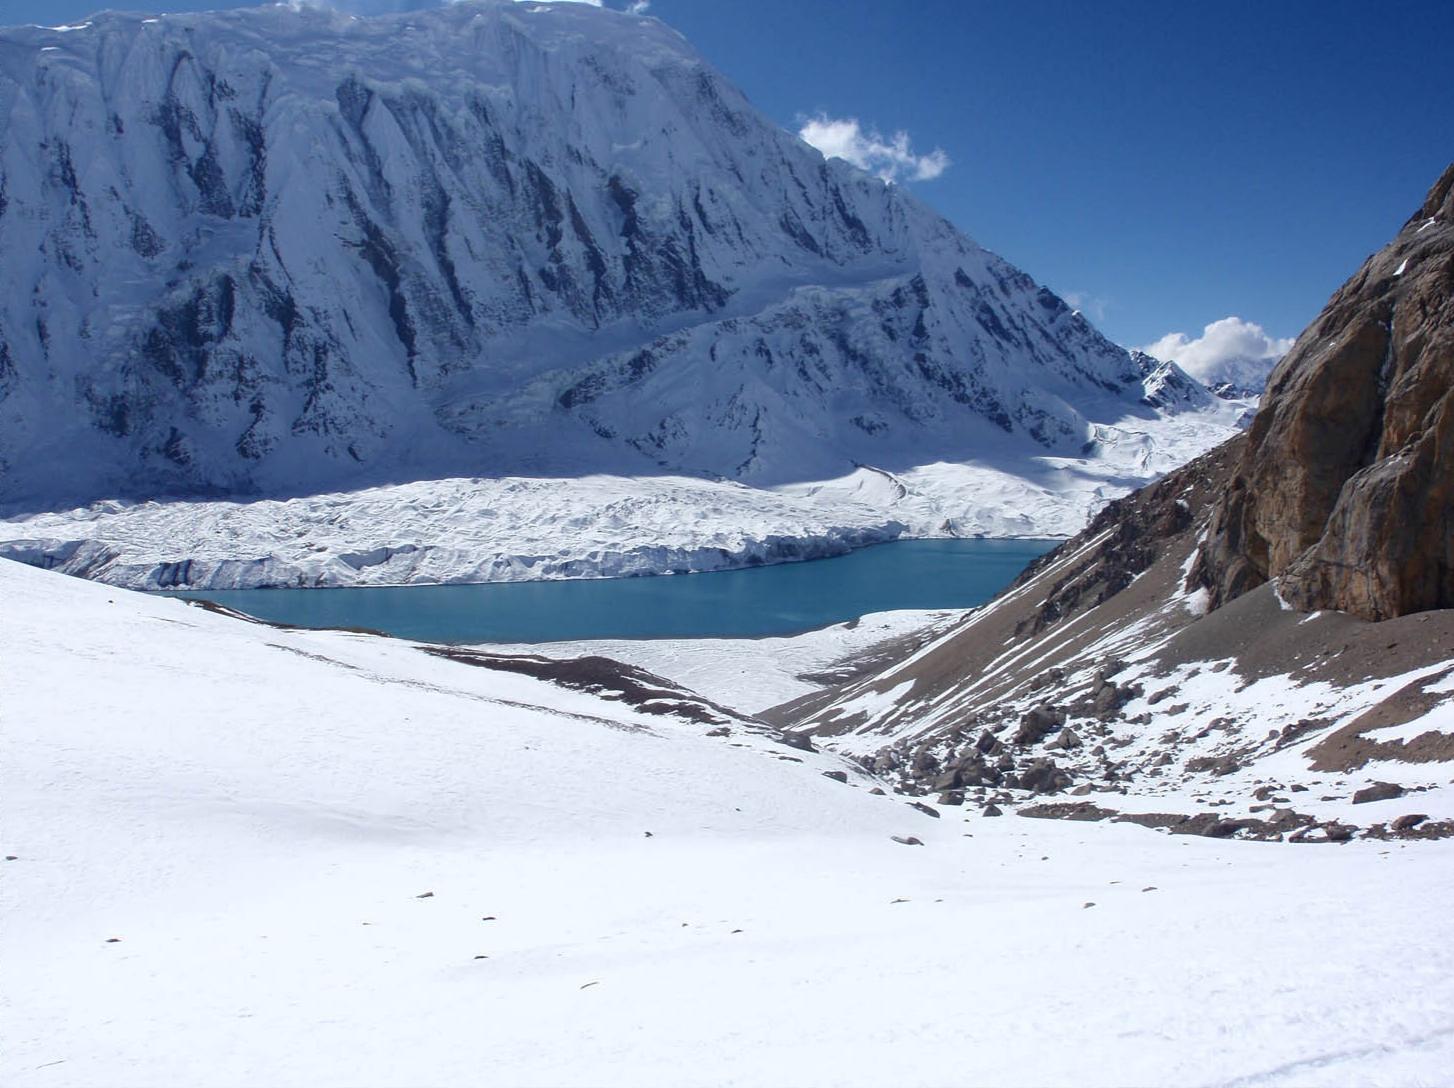 Naar Phu Tilicho - Lac Tilicho et au fond l'arête du Tilicho Peak